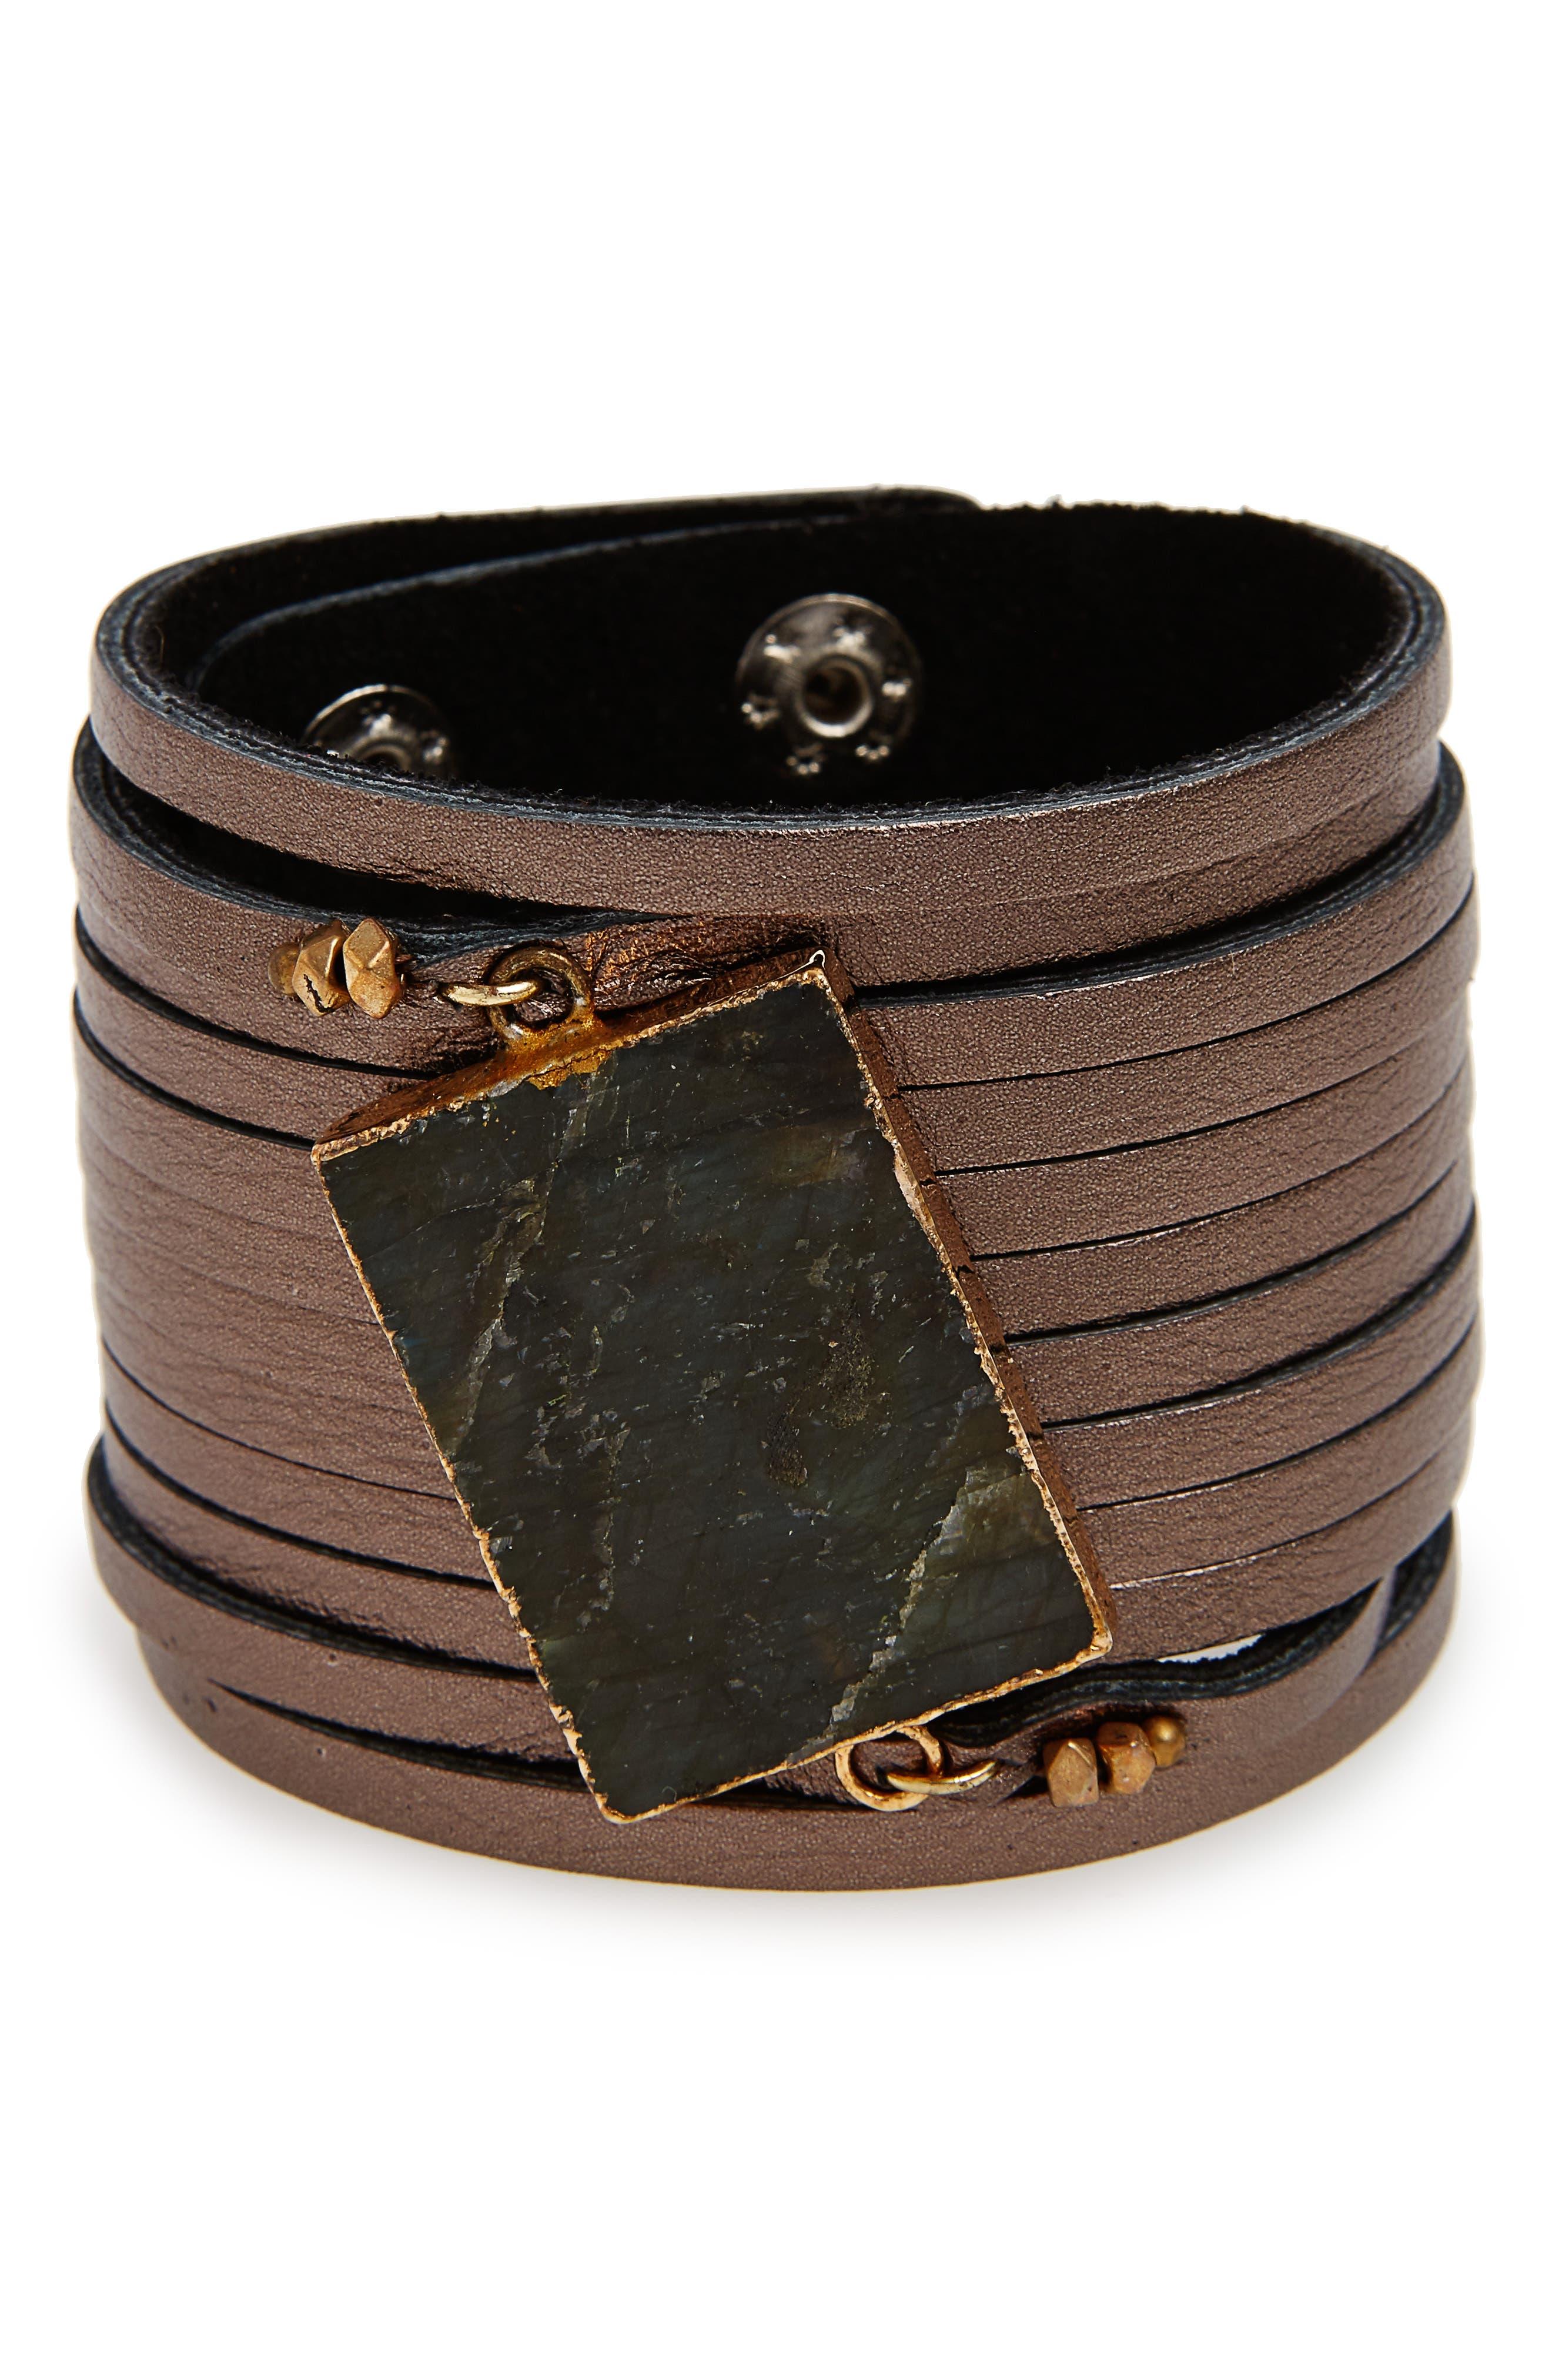 Nakamol Design Shredded Leather & Labradorite Cuff Bracelet